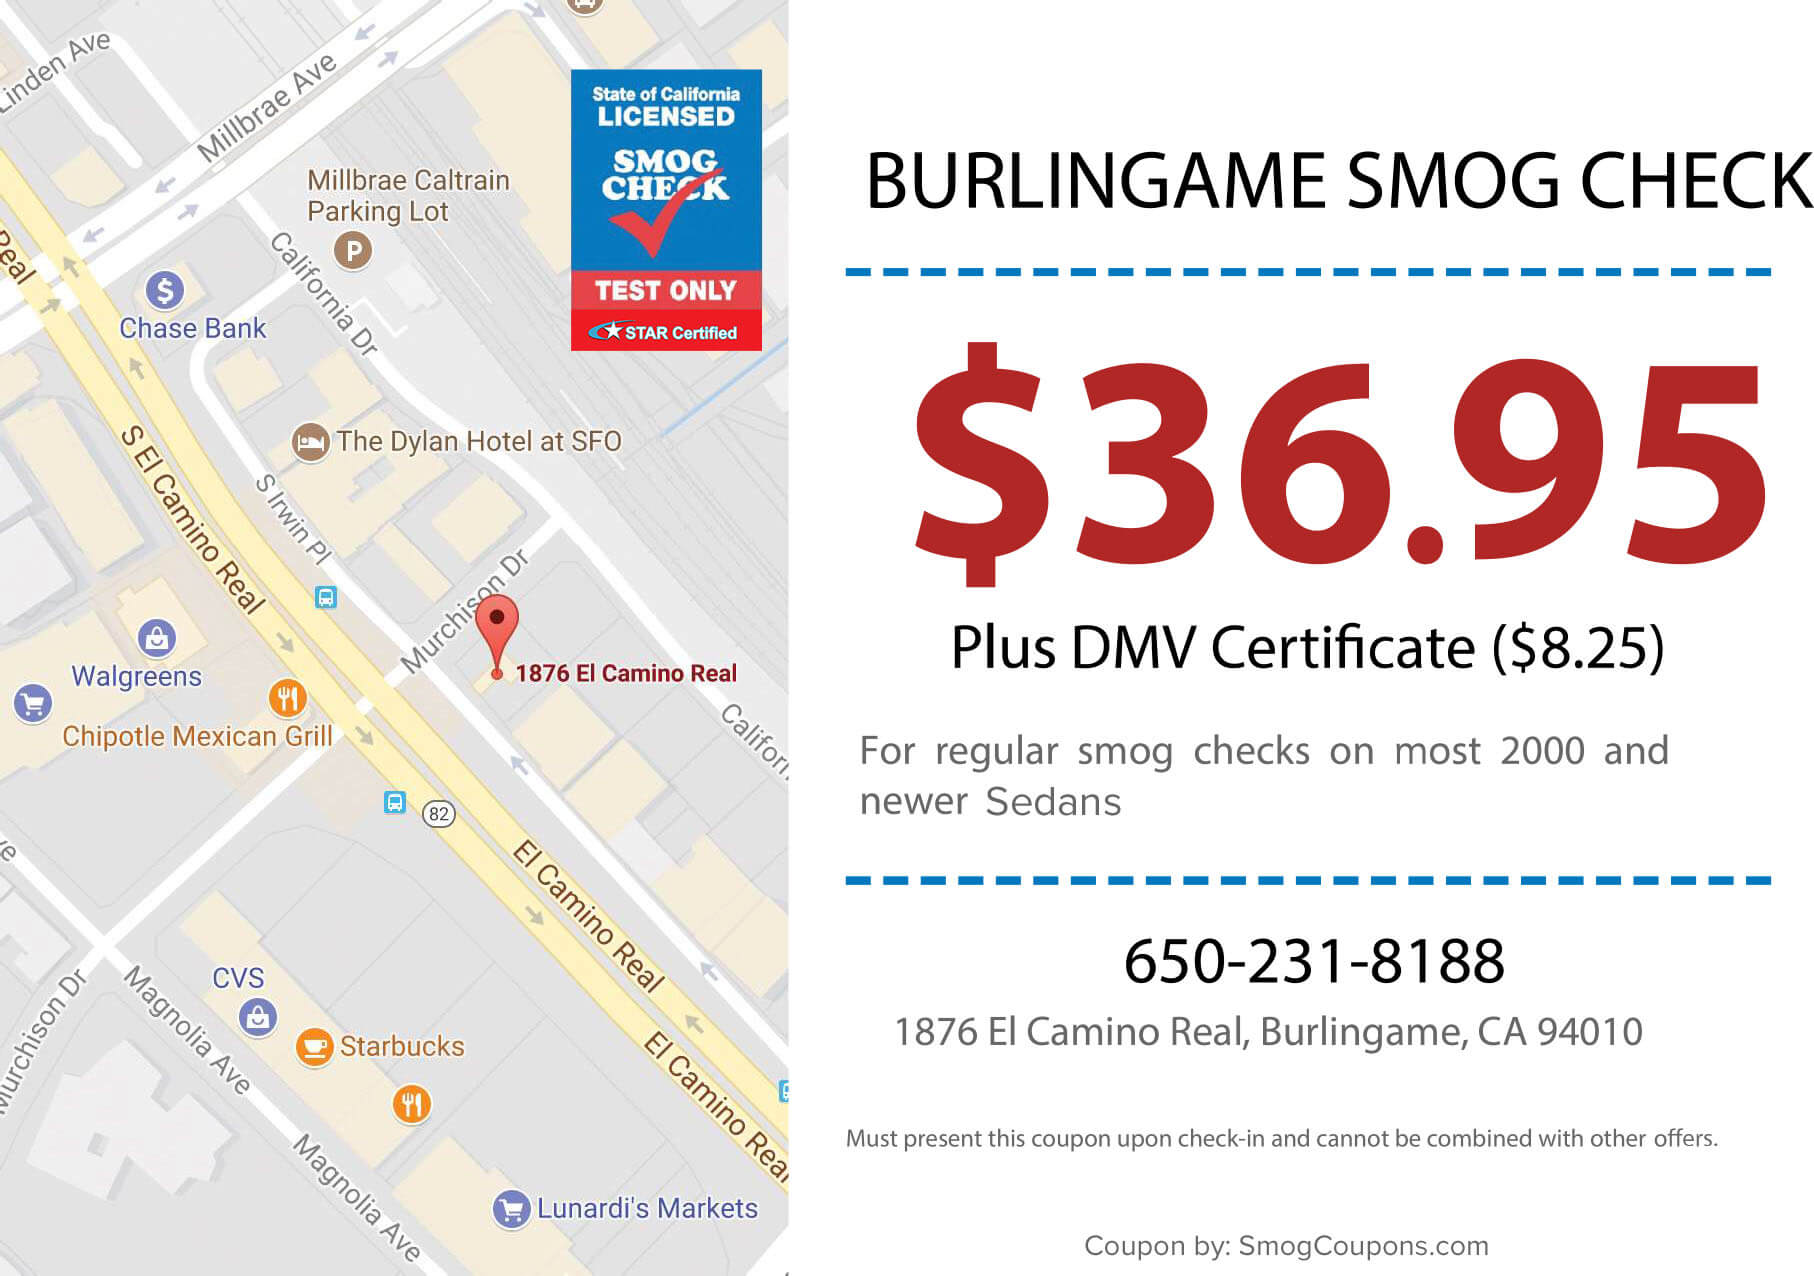 burlingame smog check smog coupons. Black Bedroom Furniture Sets. Home Design Ideas